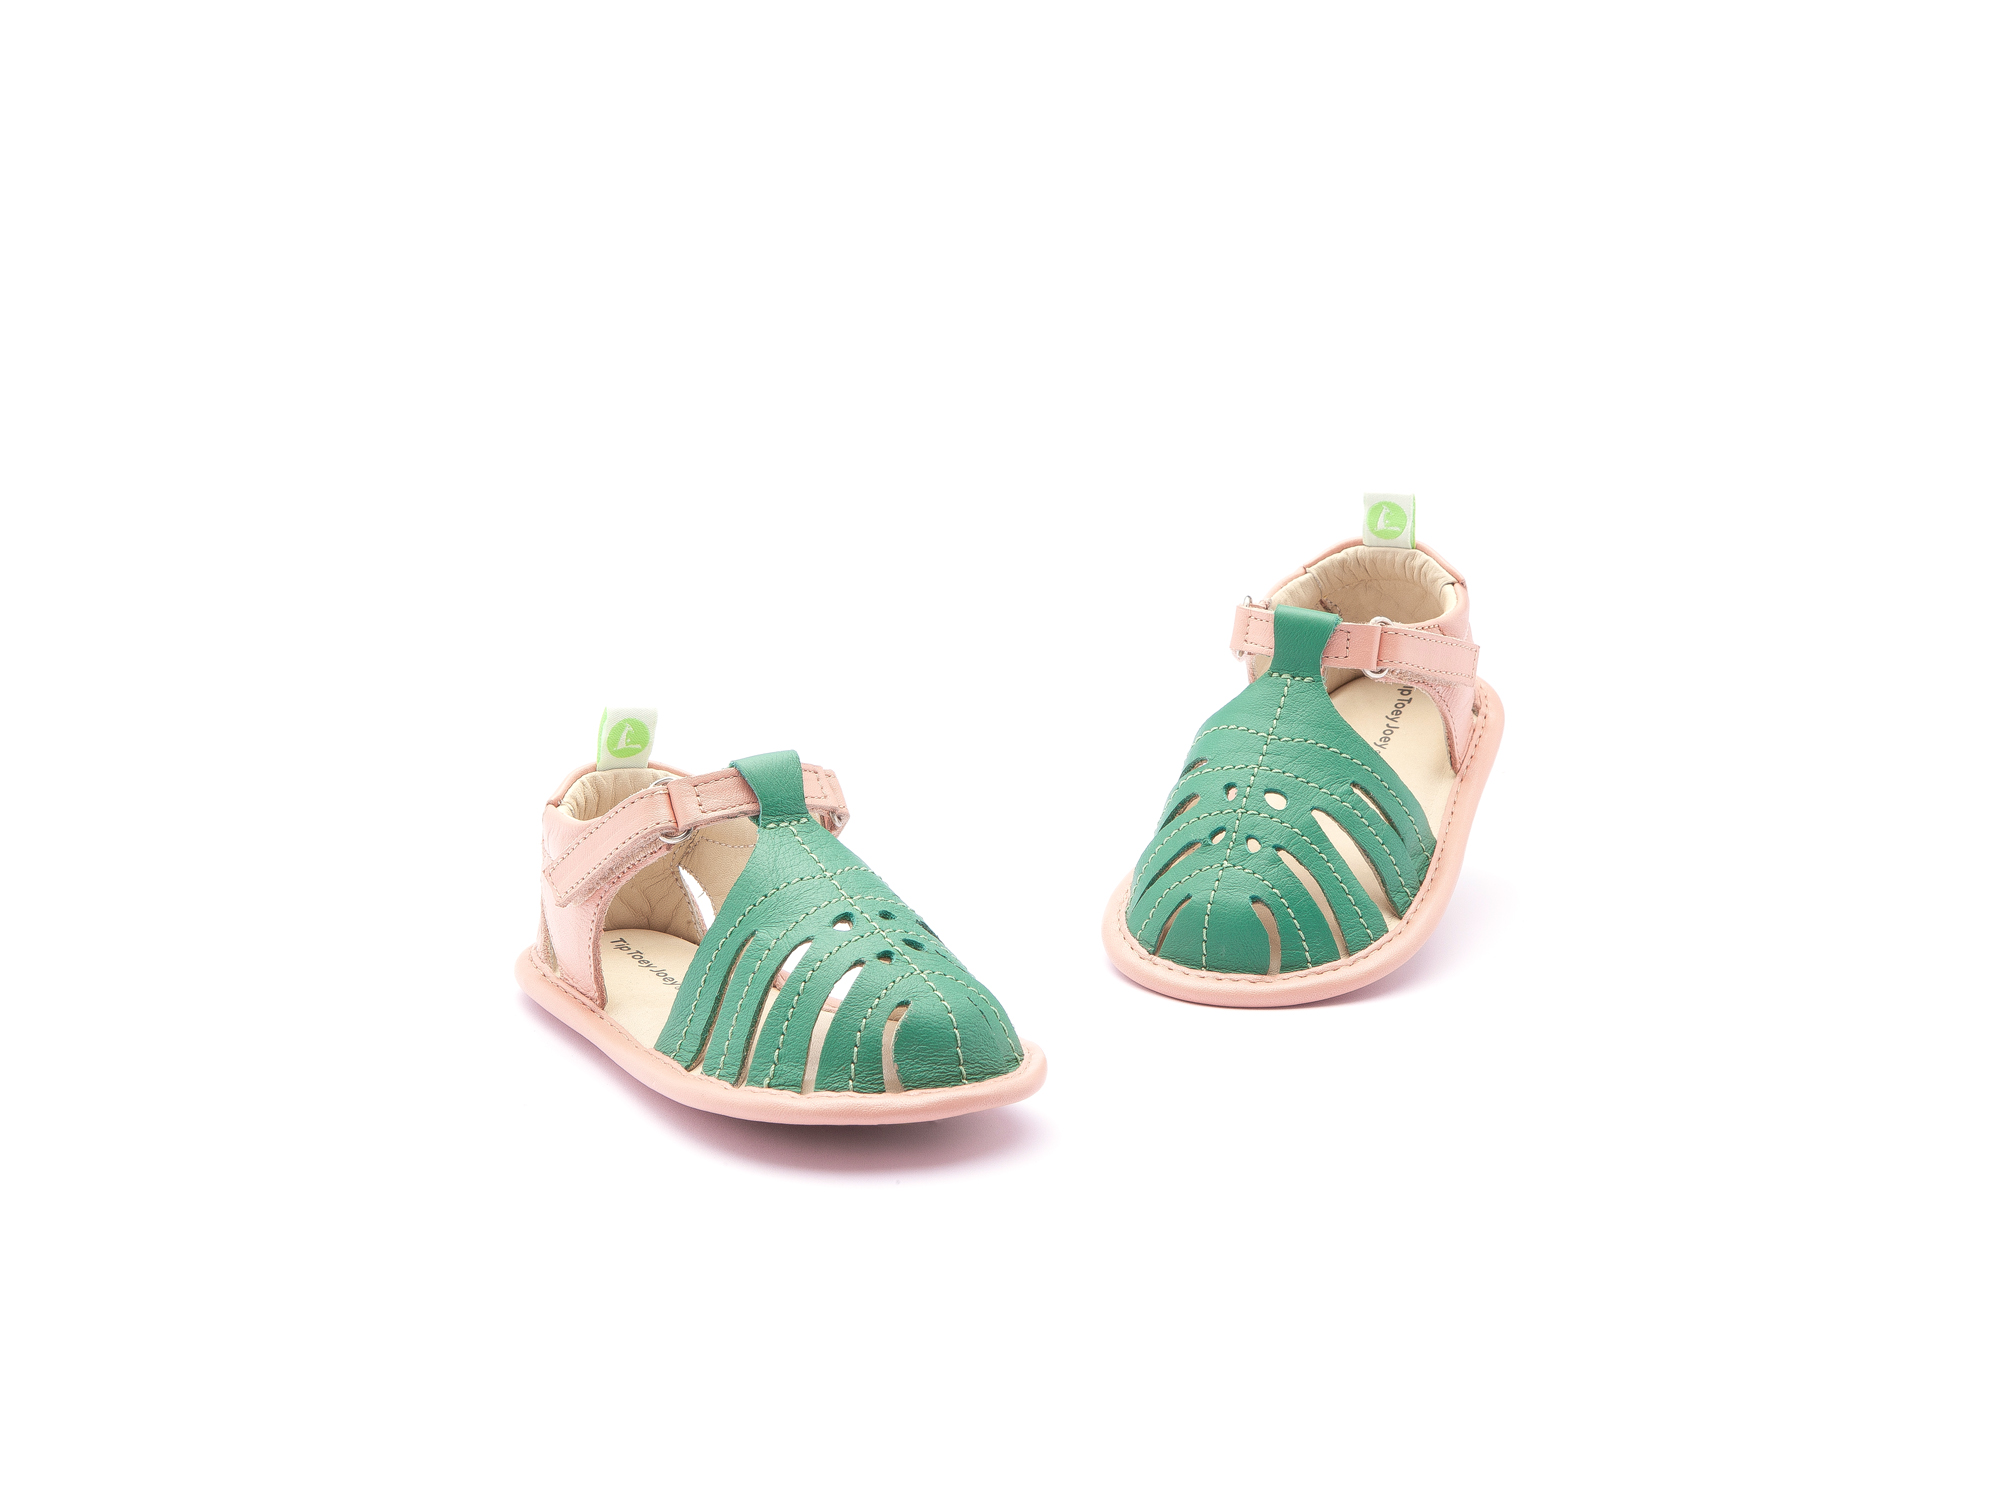 Sandália Tropically Green Leaf/ Flamingo Baby 0 à 2 anos - 2